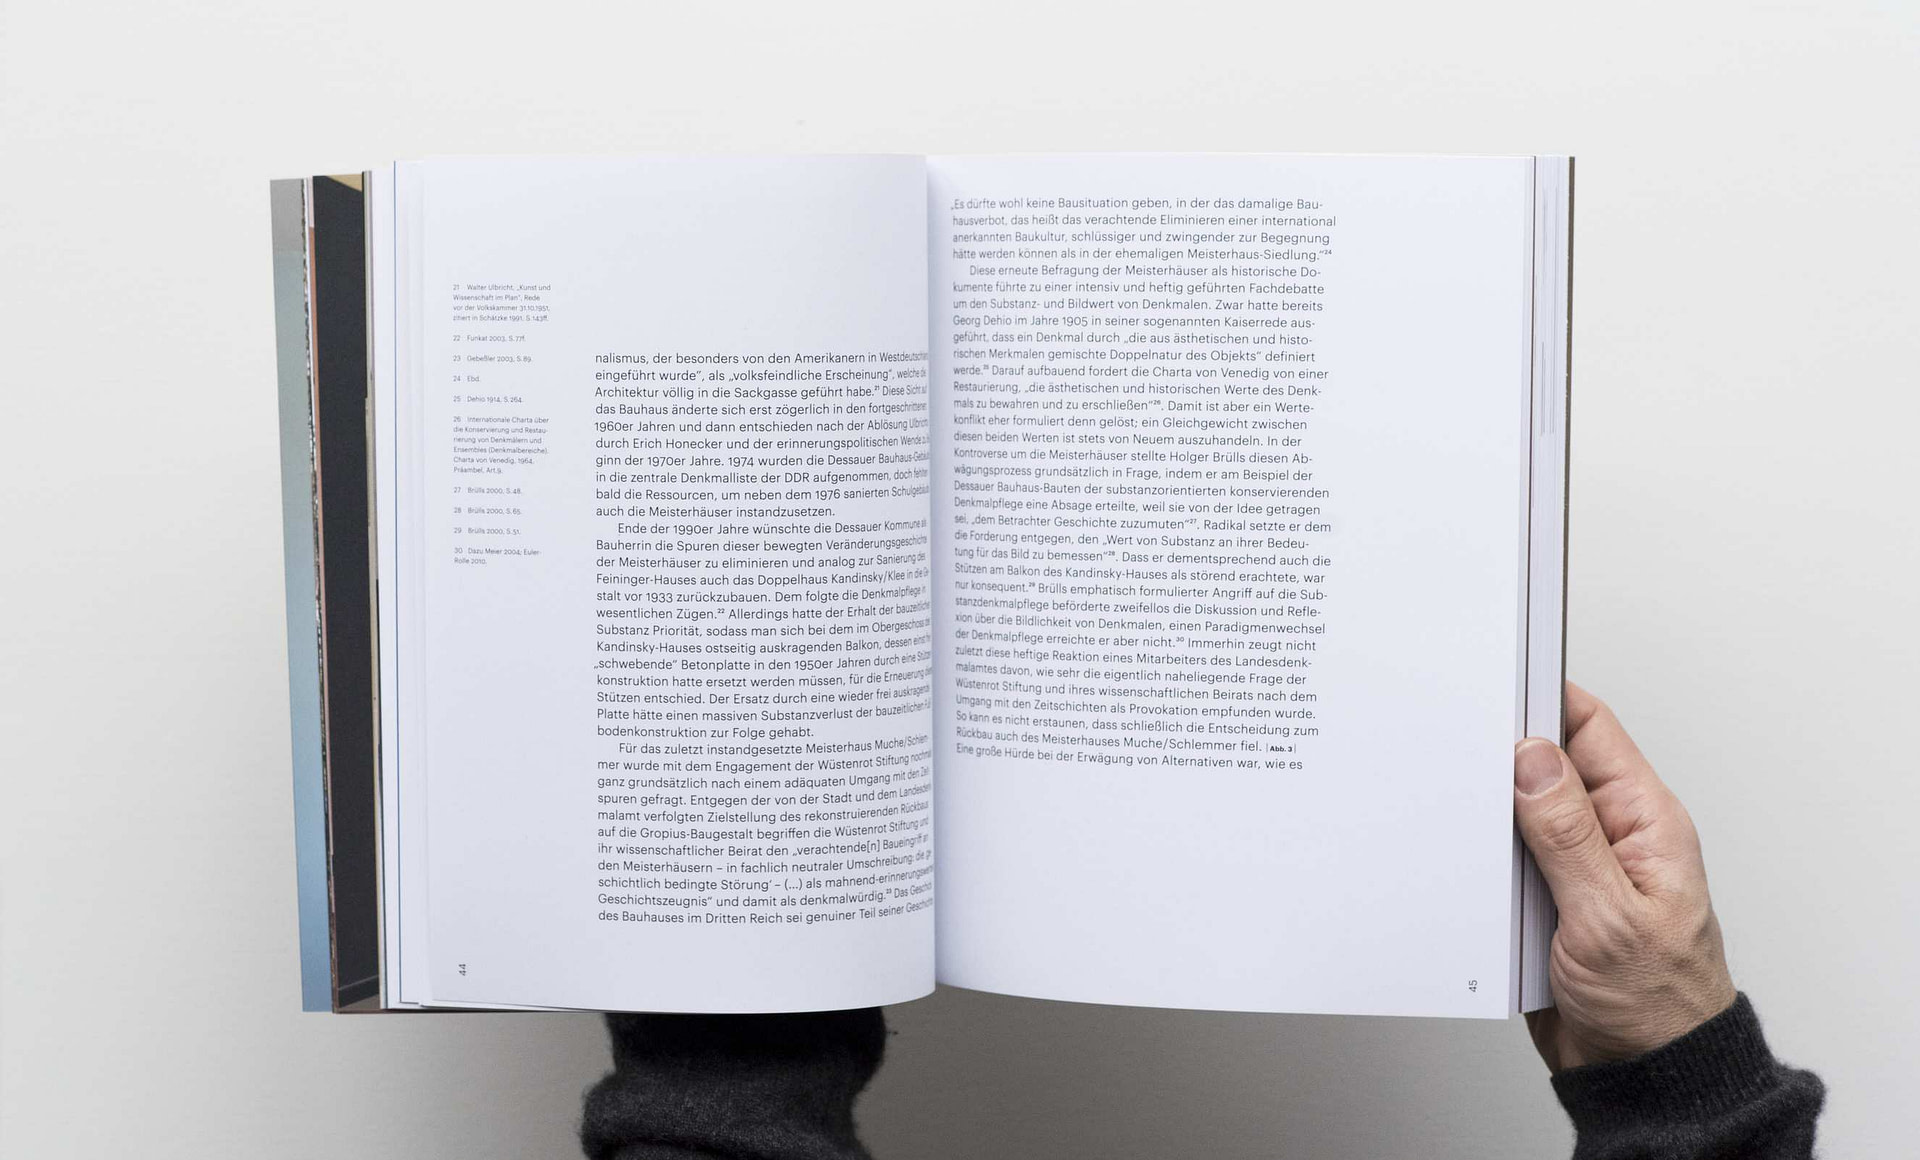 meisterhaus-kandinsky-klee-book-7-2650x1600px